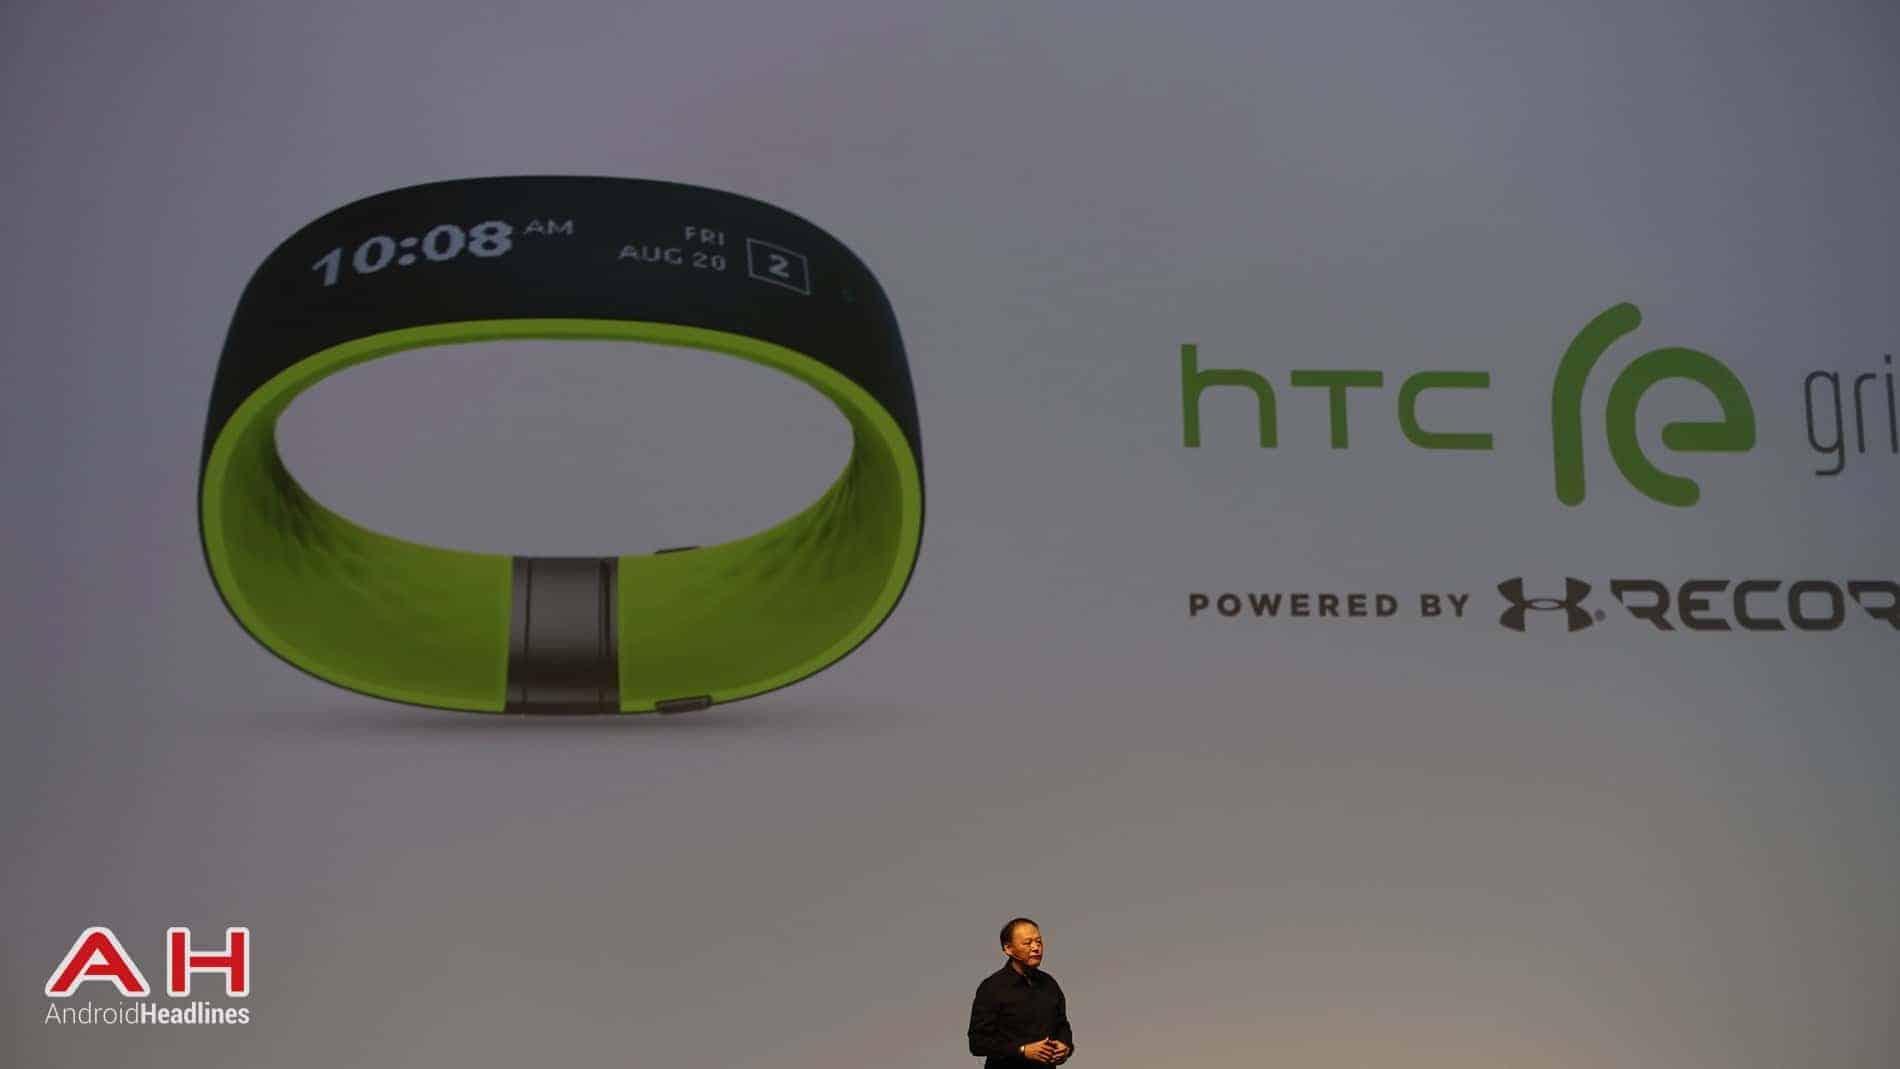 HTC Re Grip AH 5